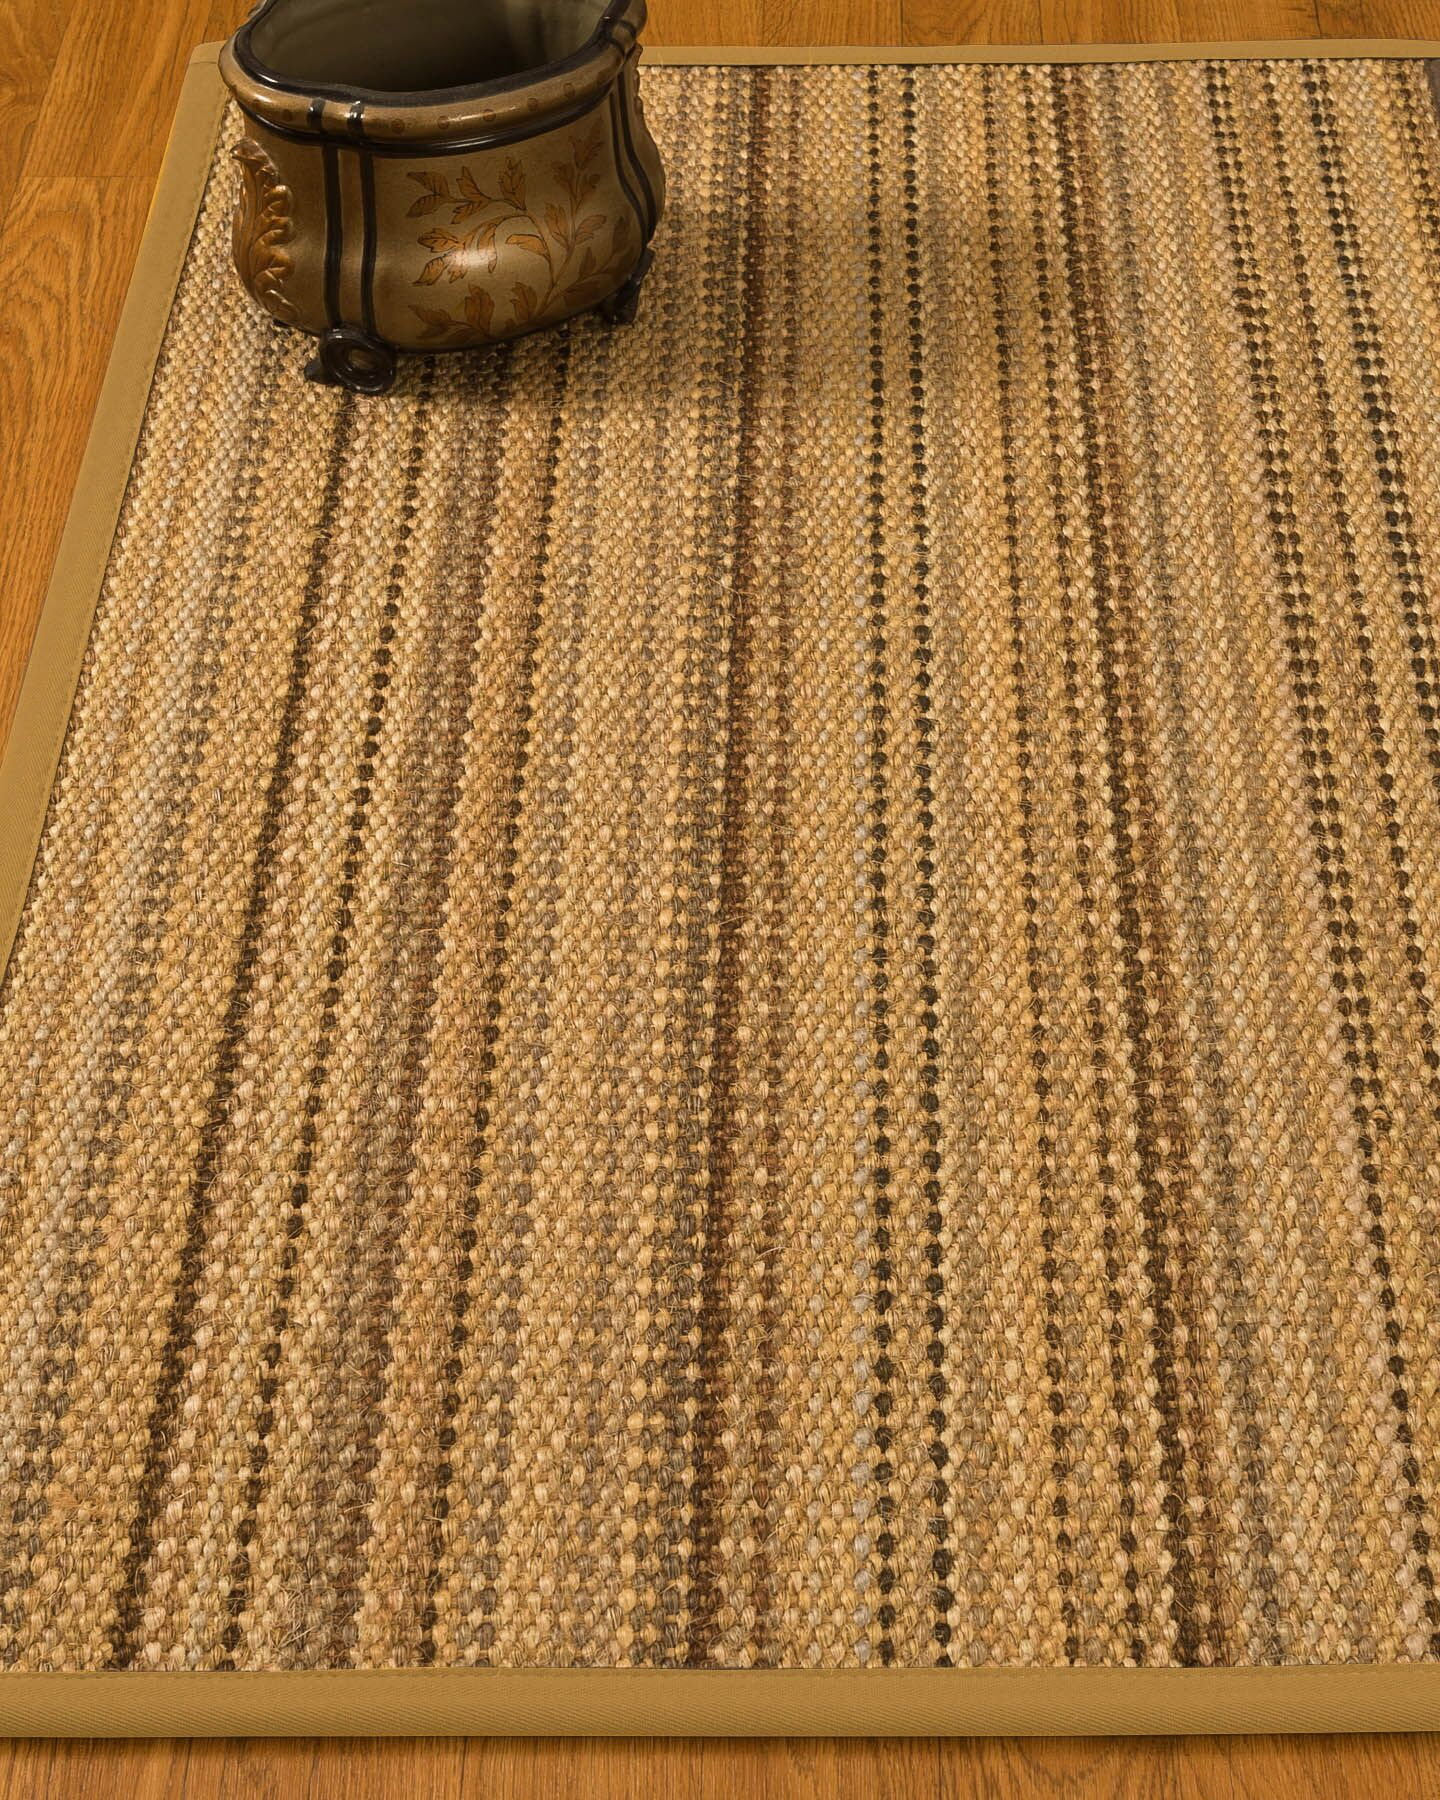 Kimmel Hand-Woven Beige Area Rug Rug Size: Rectangle 3' x 5'